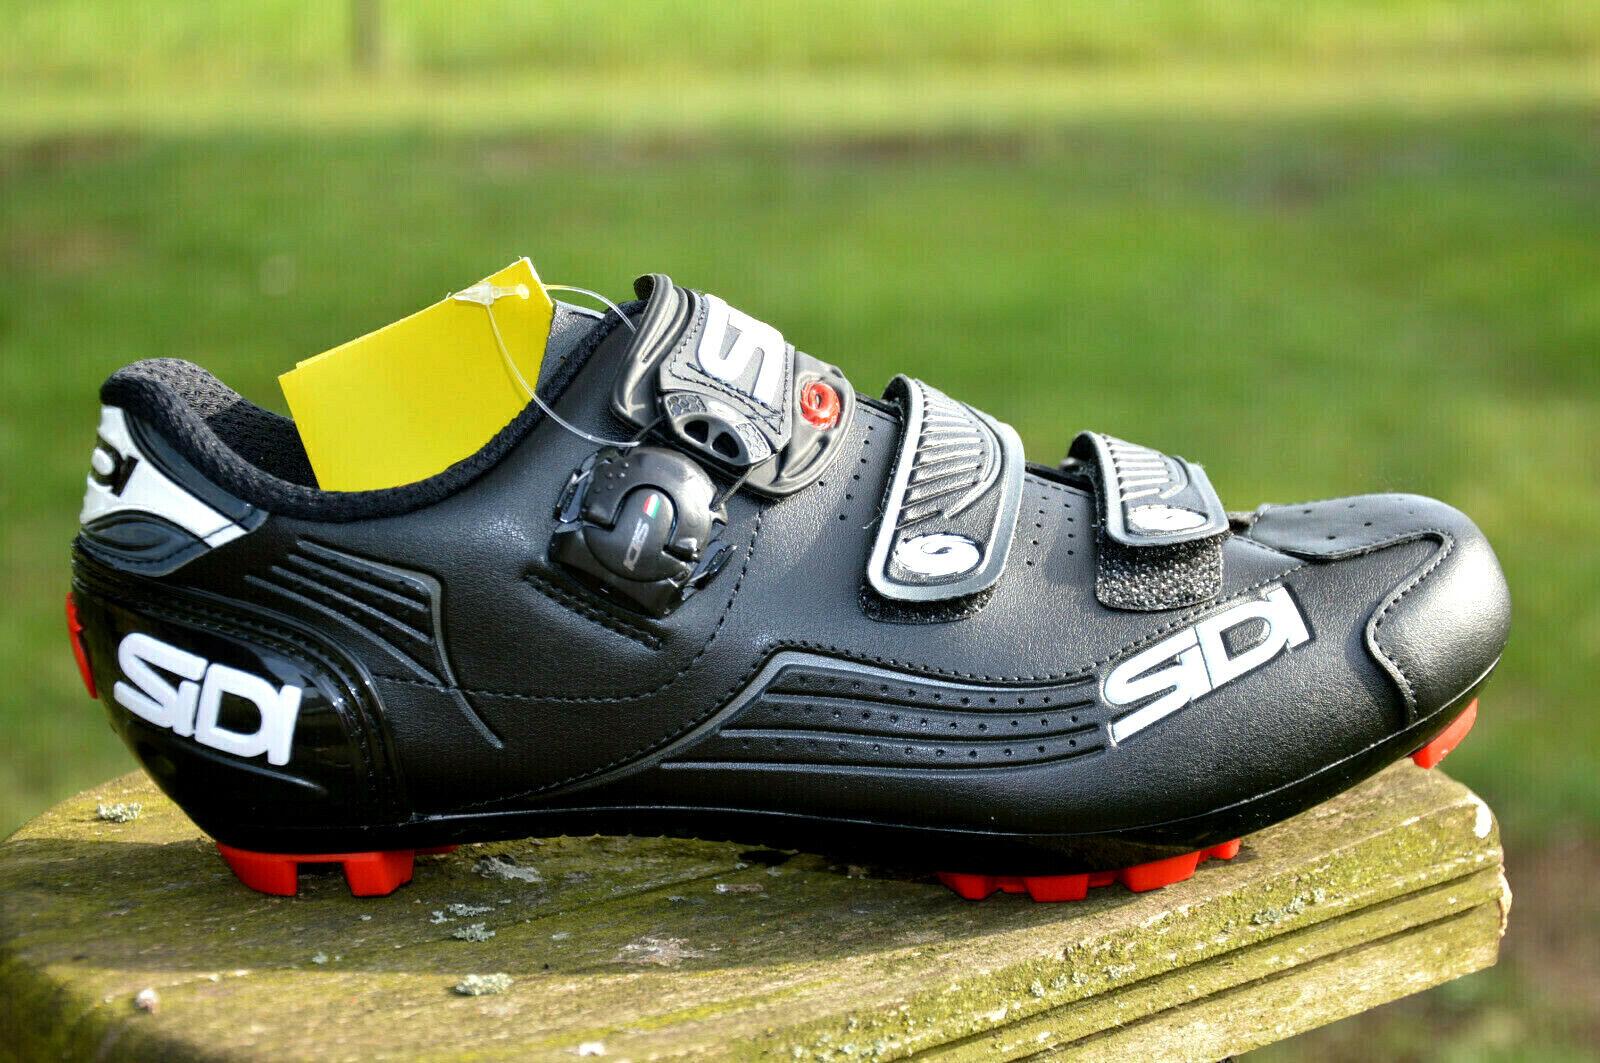 8fb3e6bd3a6 SIDI Trace Carbon MTB Bike Shoes 3 Closure Drehsystem Black 2018 43 ...